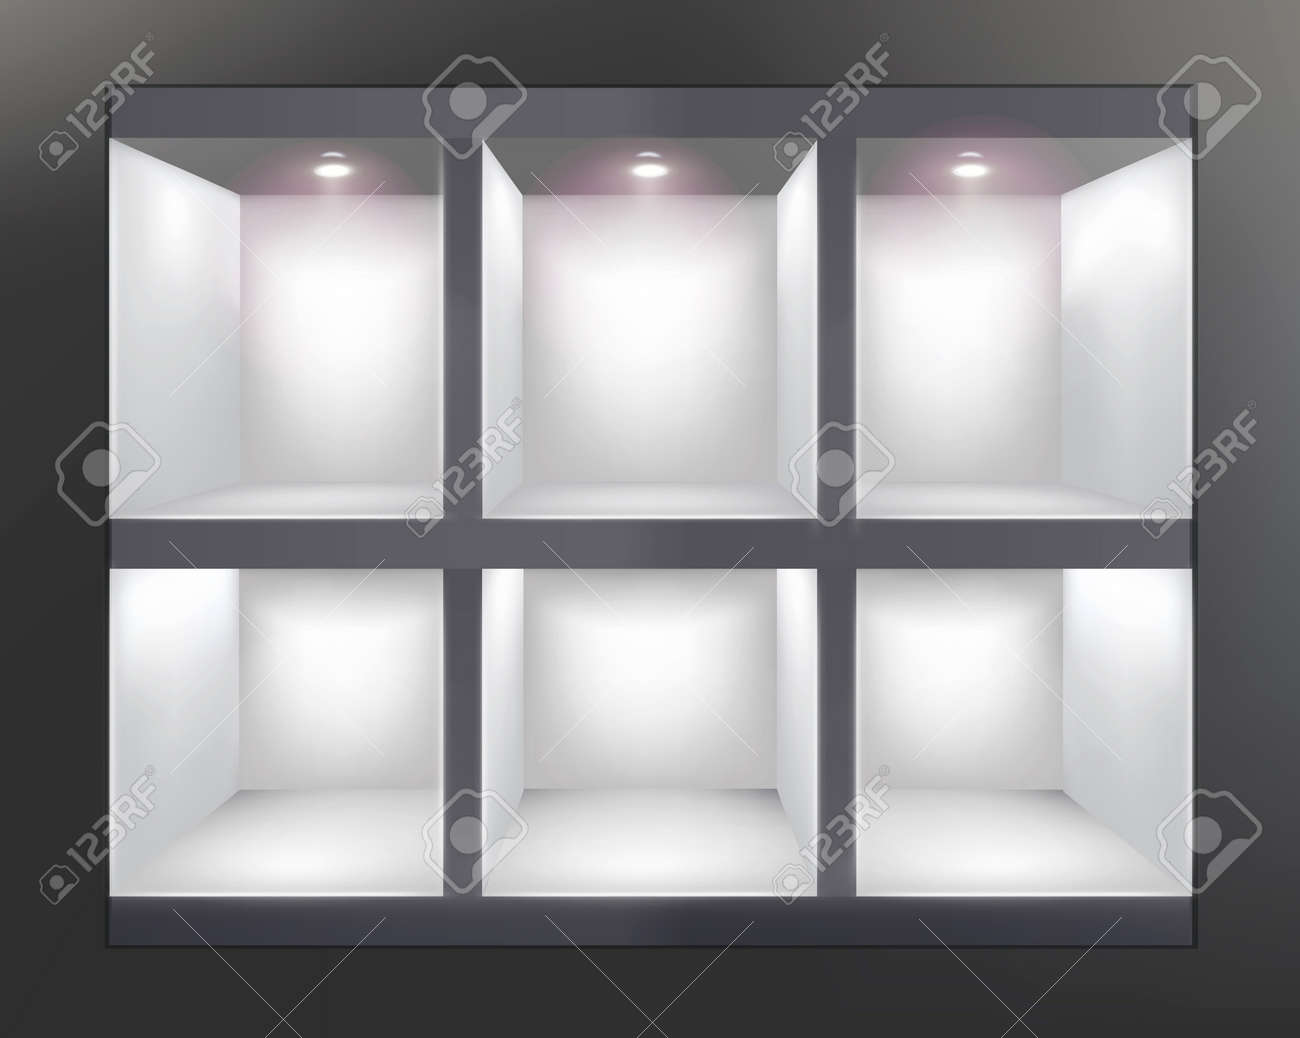 Shelves in shop  Vector illustration Stock Vector - 24523374